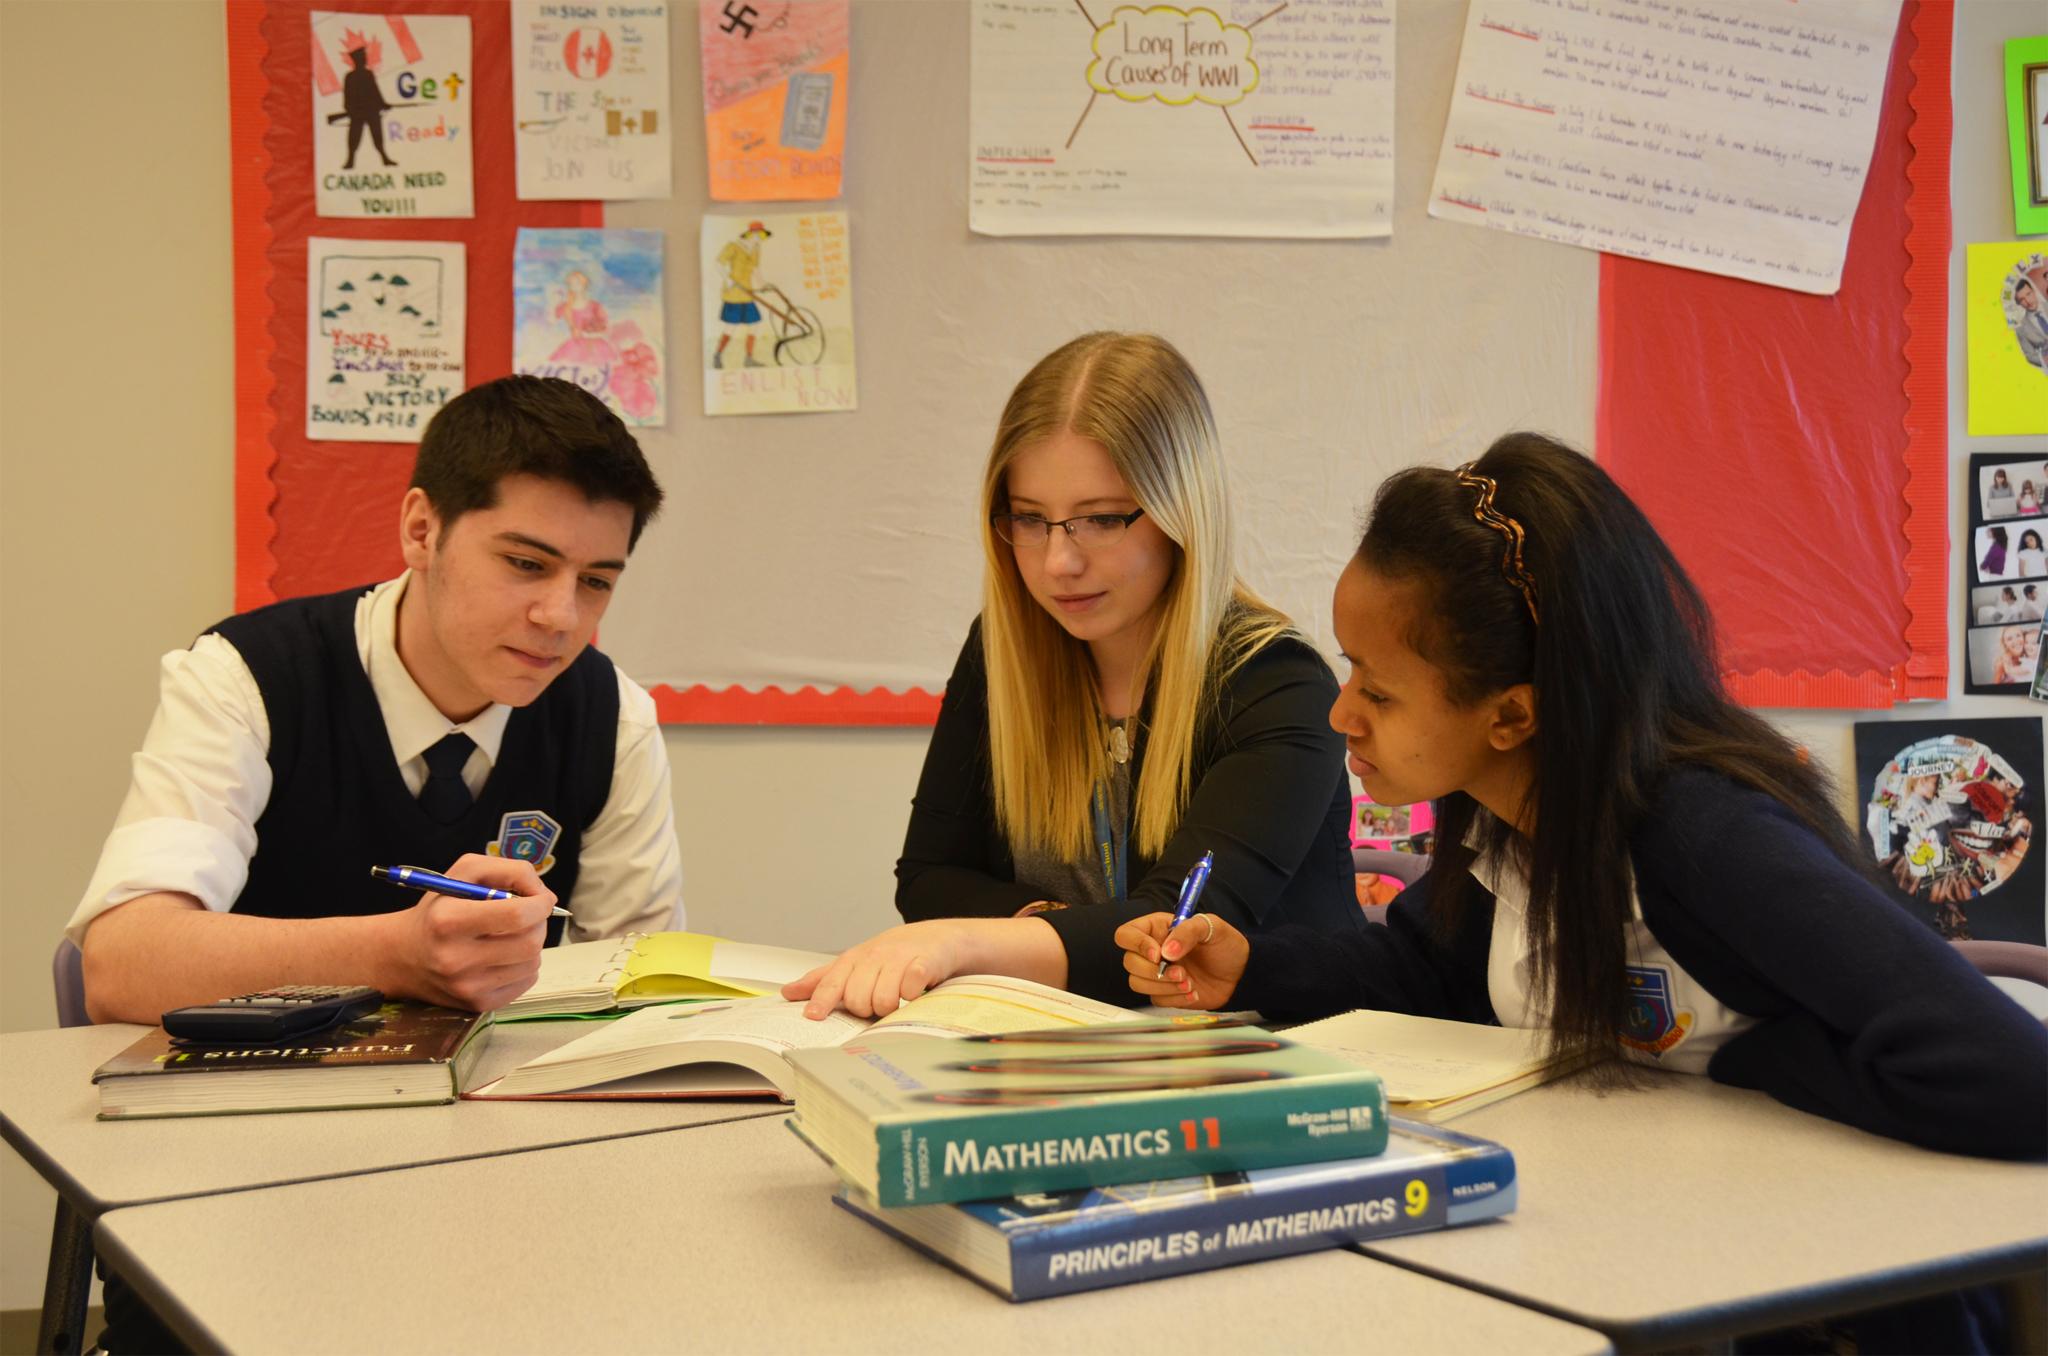 J Addison School in Markham: J. Addison School programs include personalized tutoring according to students' needs.